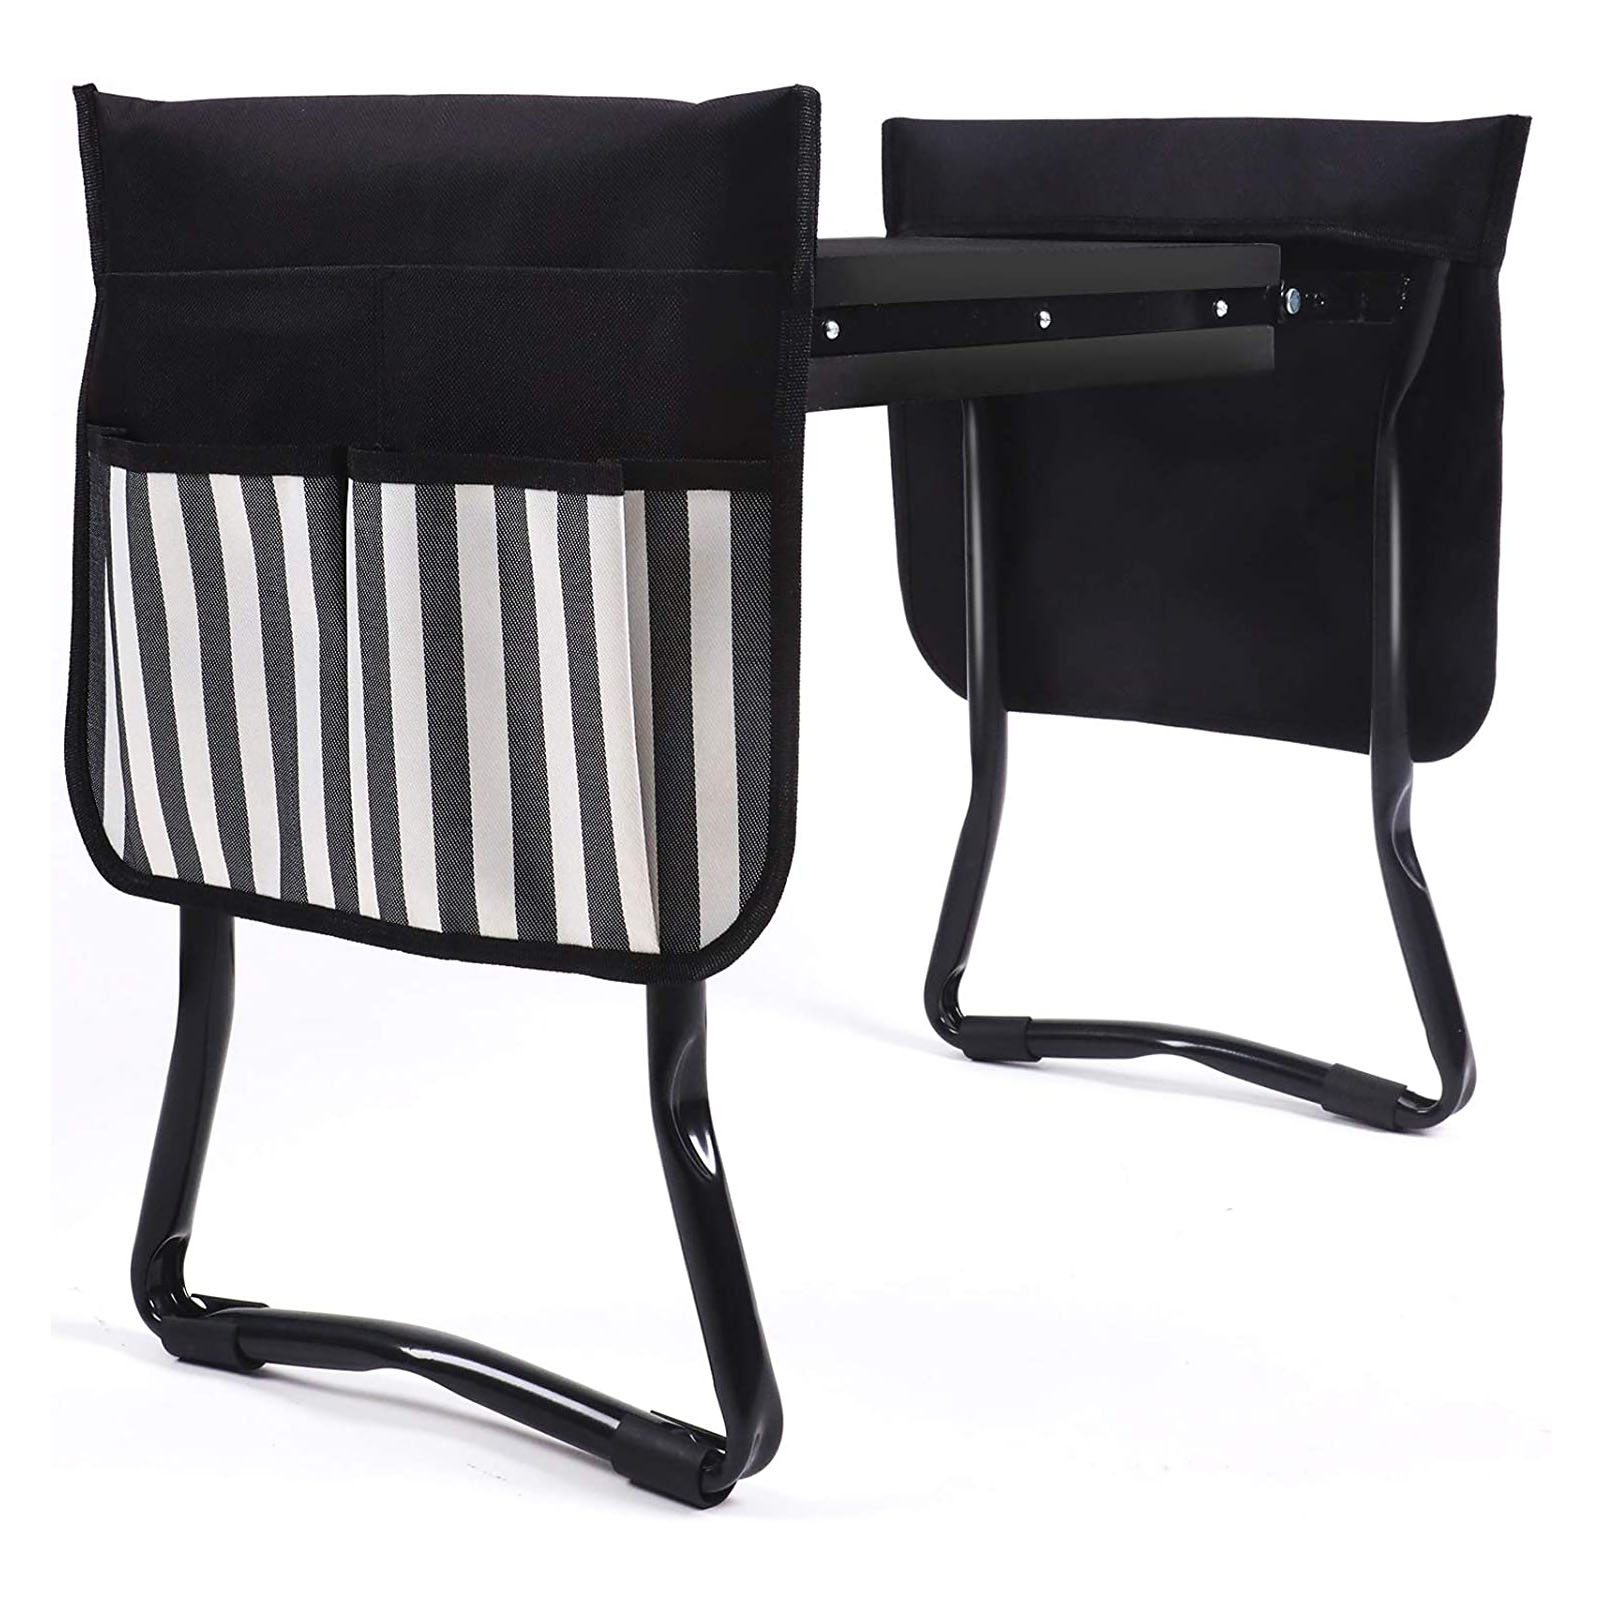 Garden Folding Stainless Kneeler Multi-Functional Seat Removable with 2 Tool Bags EVA Kneeling Pad Gardening Gifts